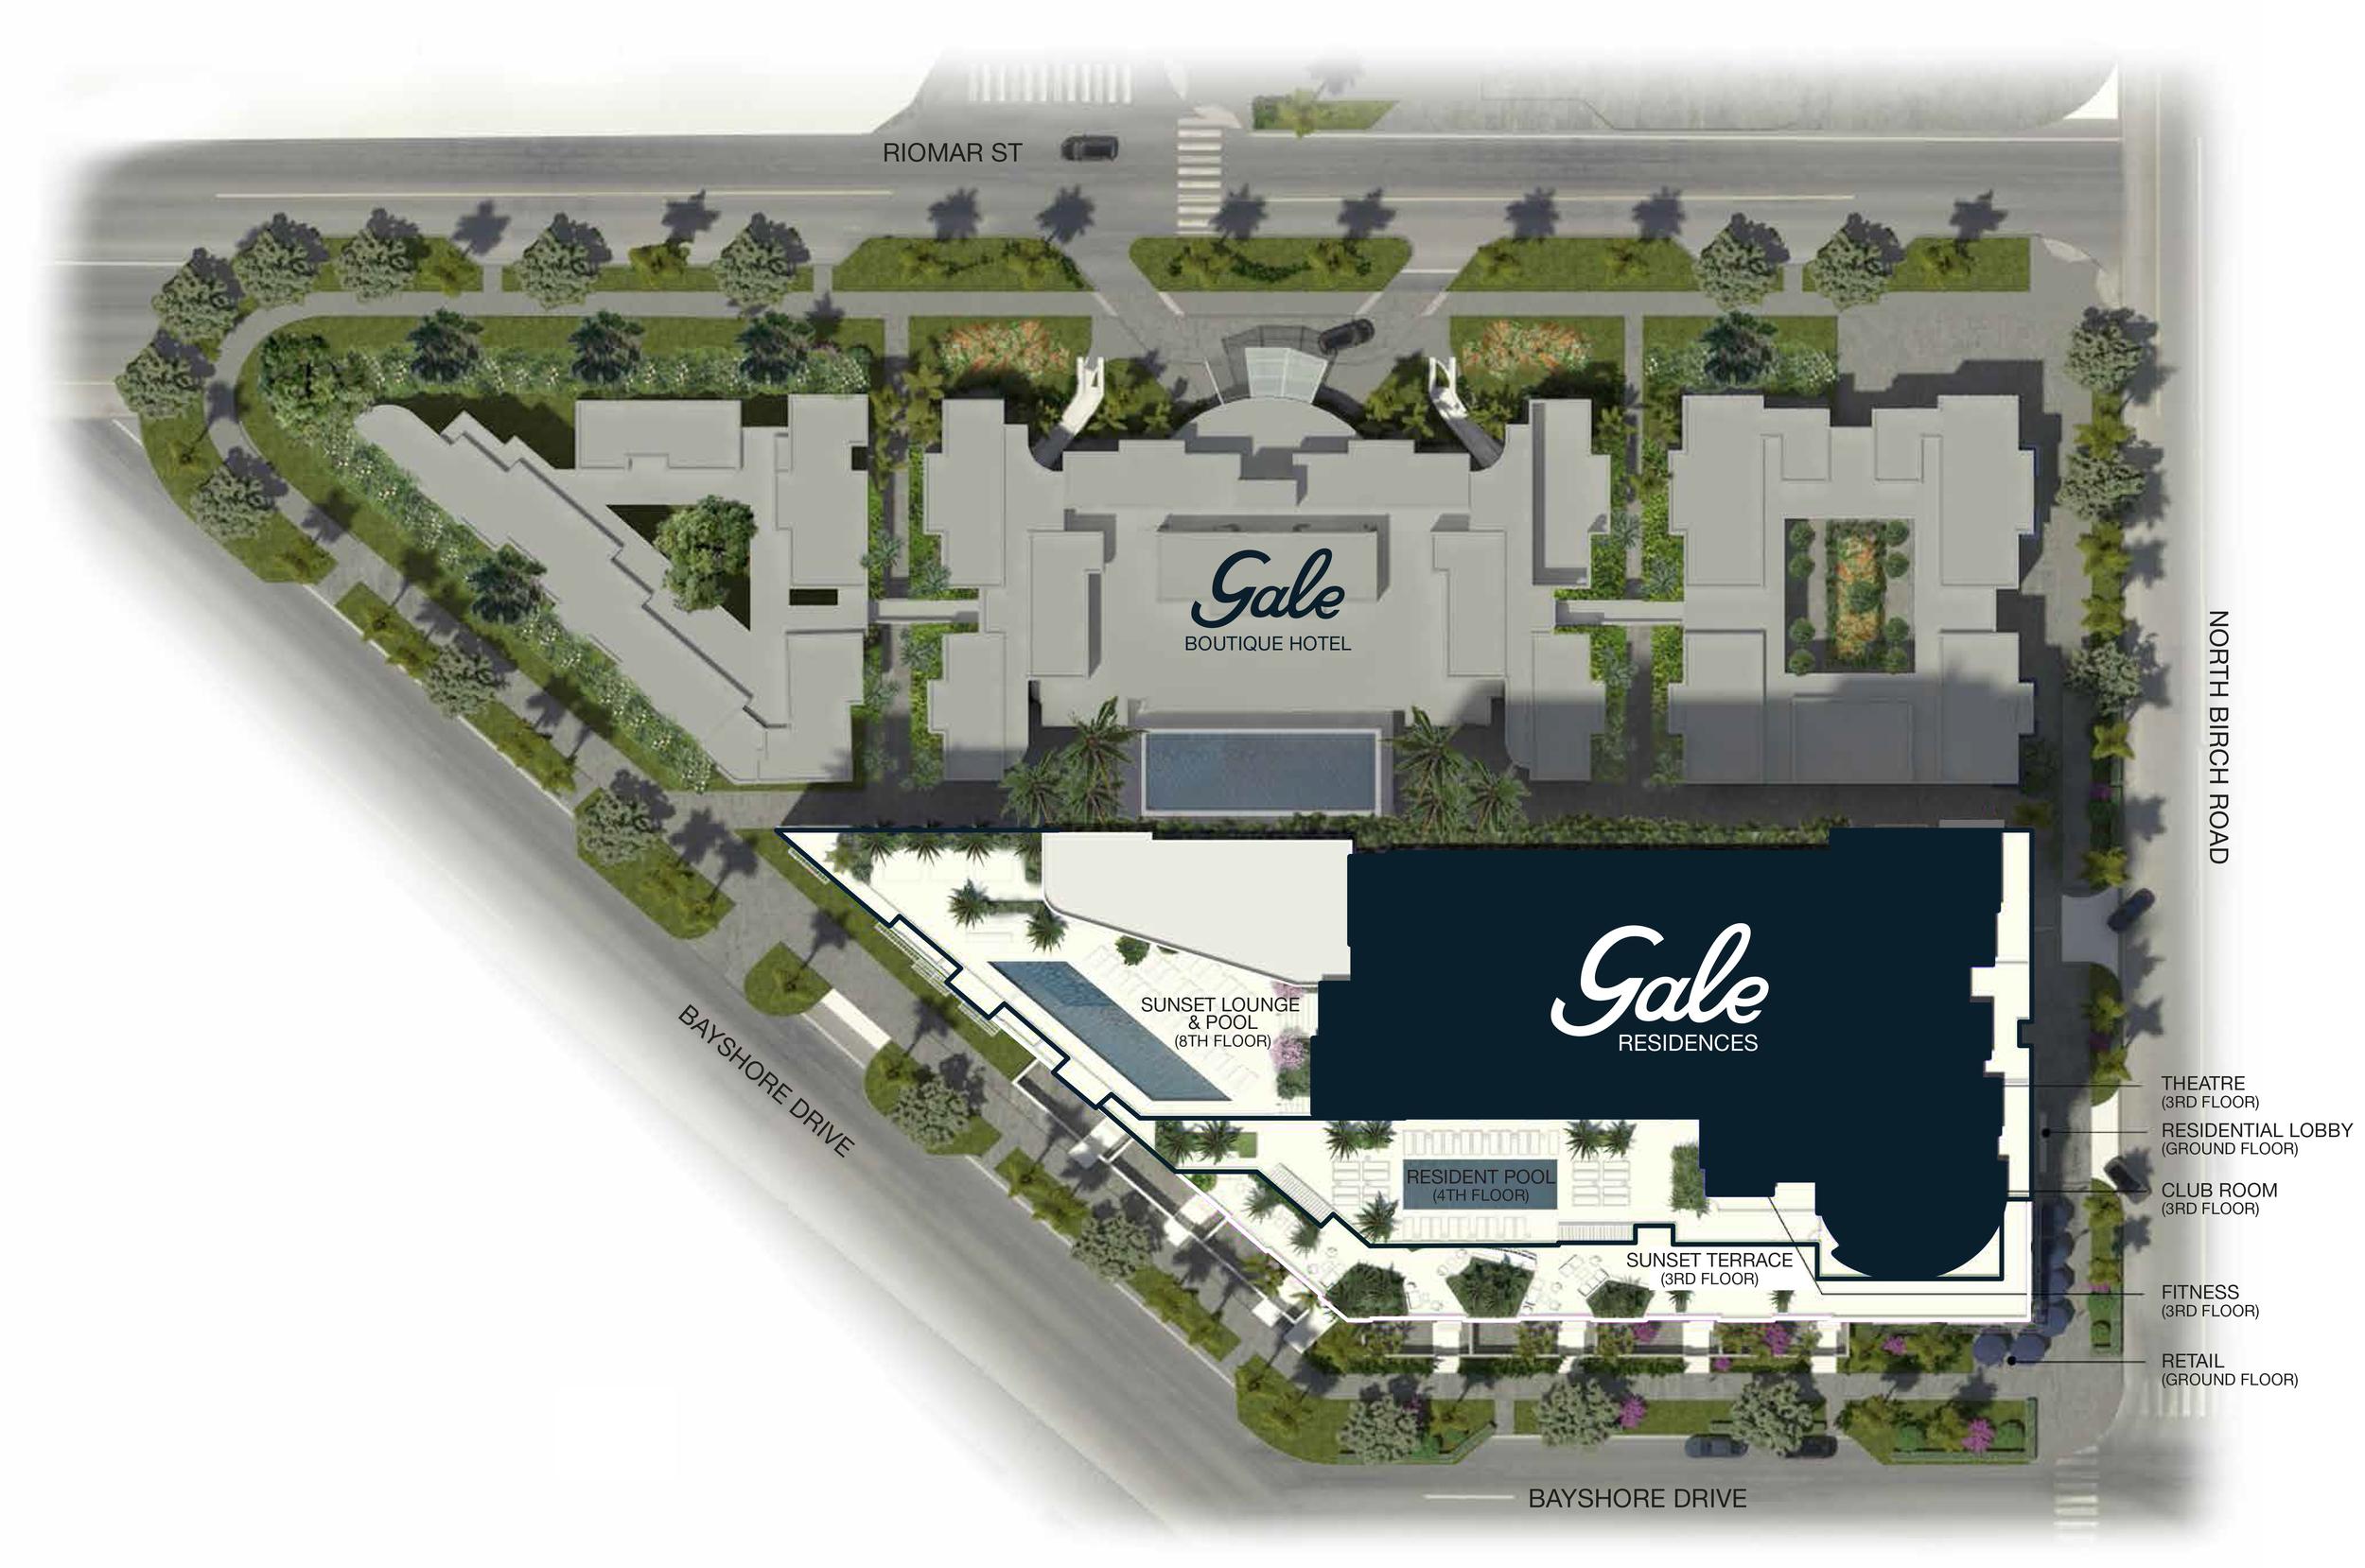 Gale Boutique Hotel & Residences Ft.Lauderdale Site Plan